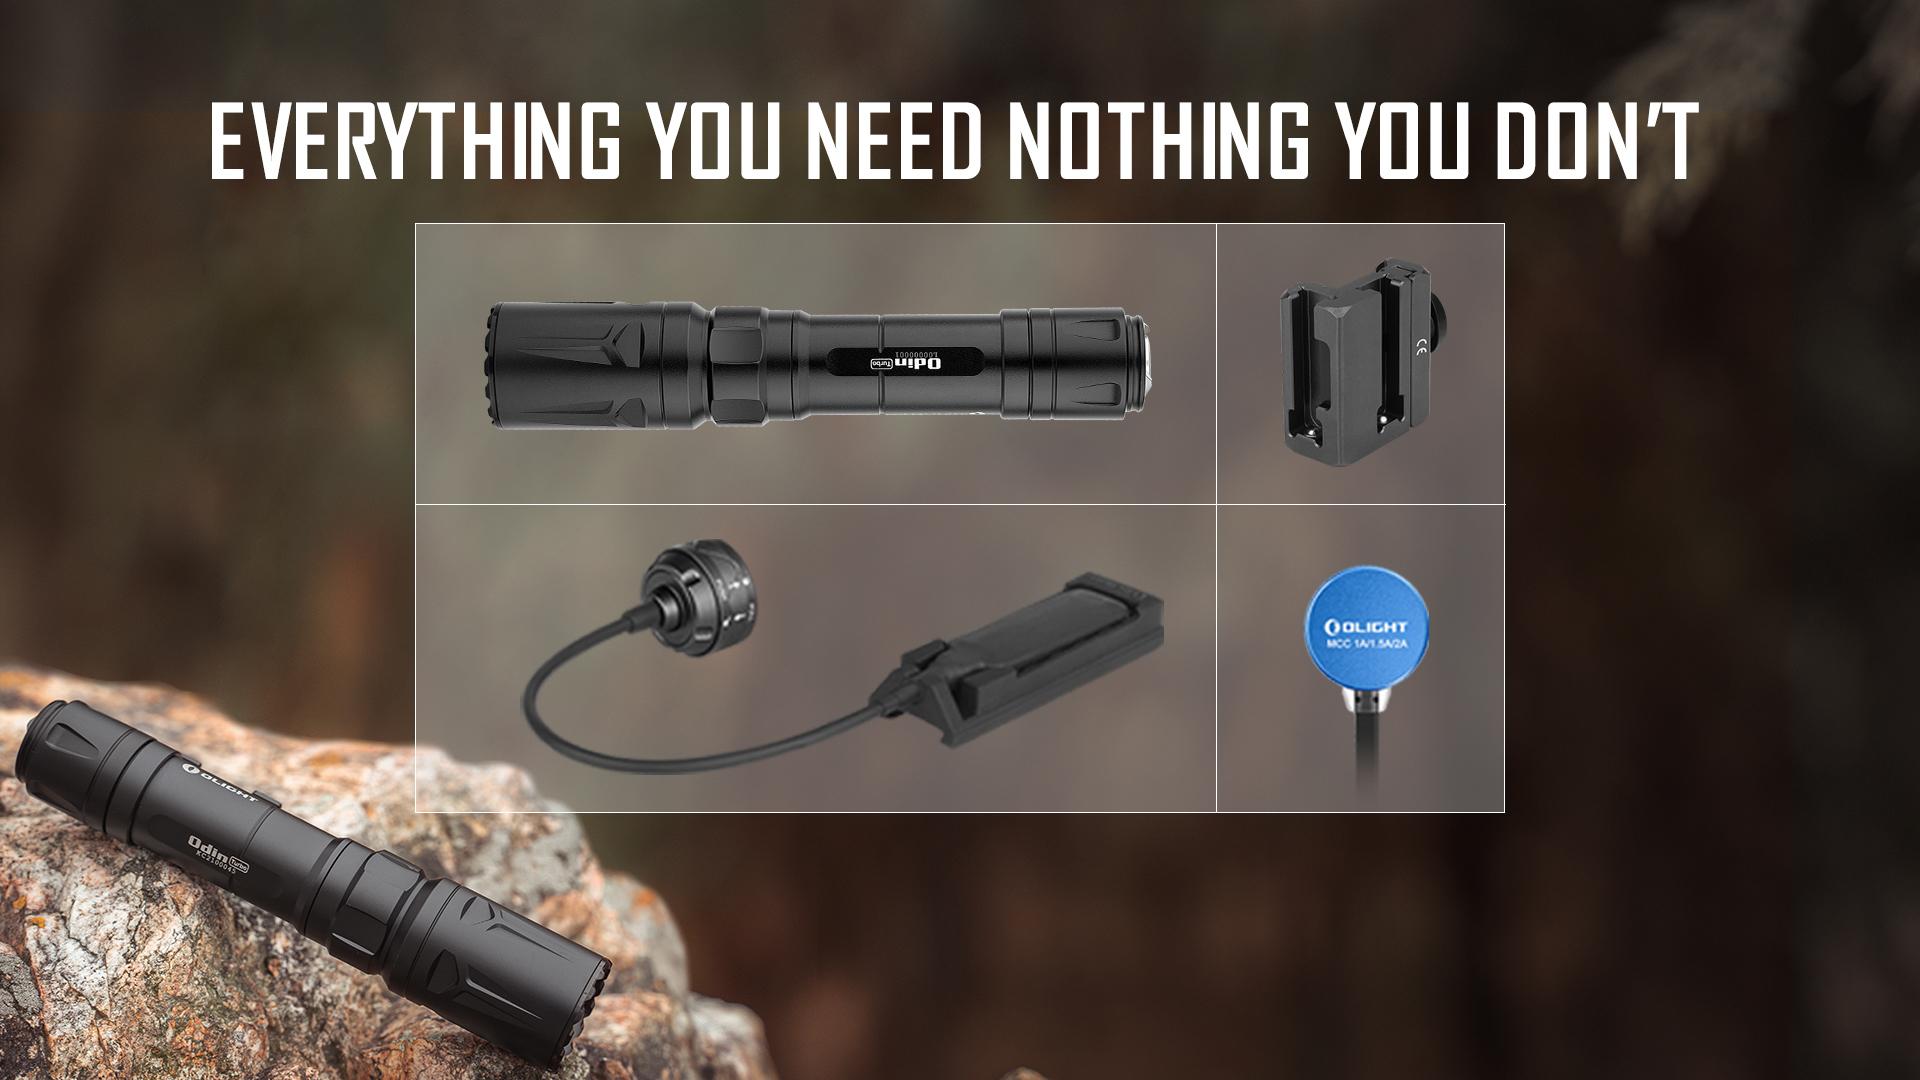 odin turbo powerful flashlight